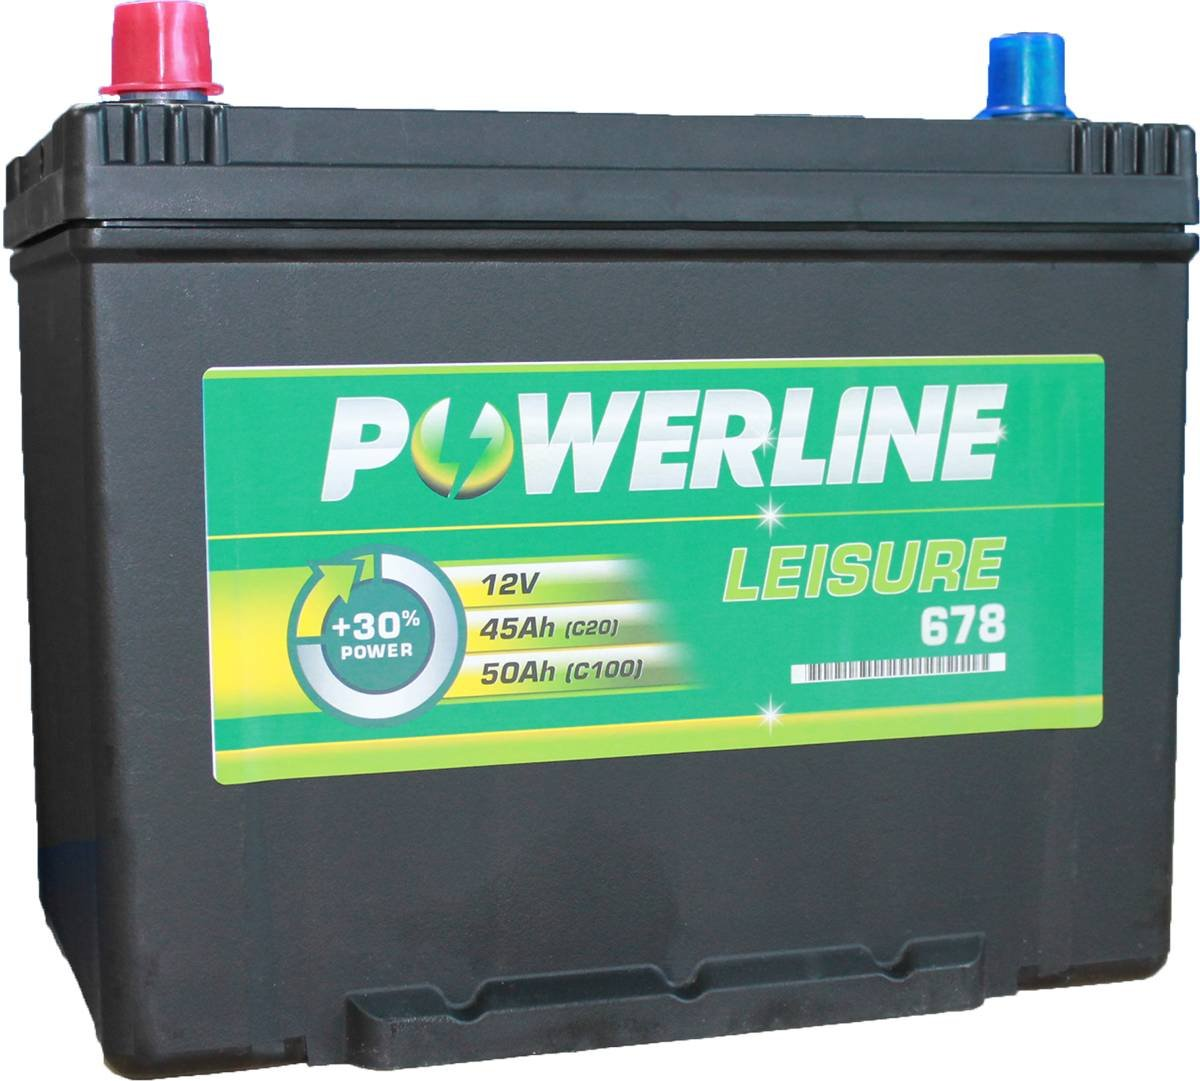 Leisure Battery 678 - Powerline Caravan/Leisure/Marine Battery